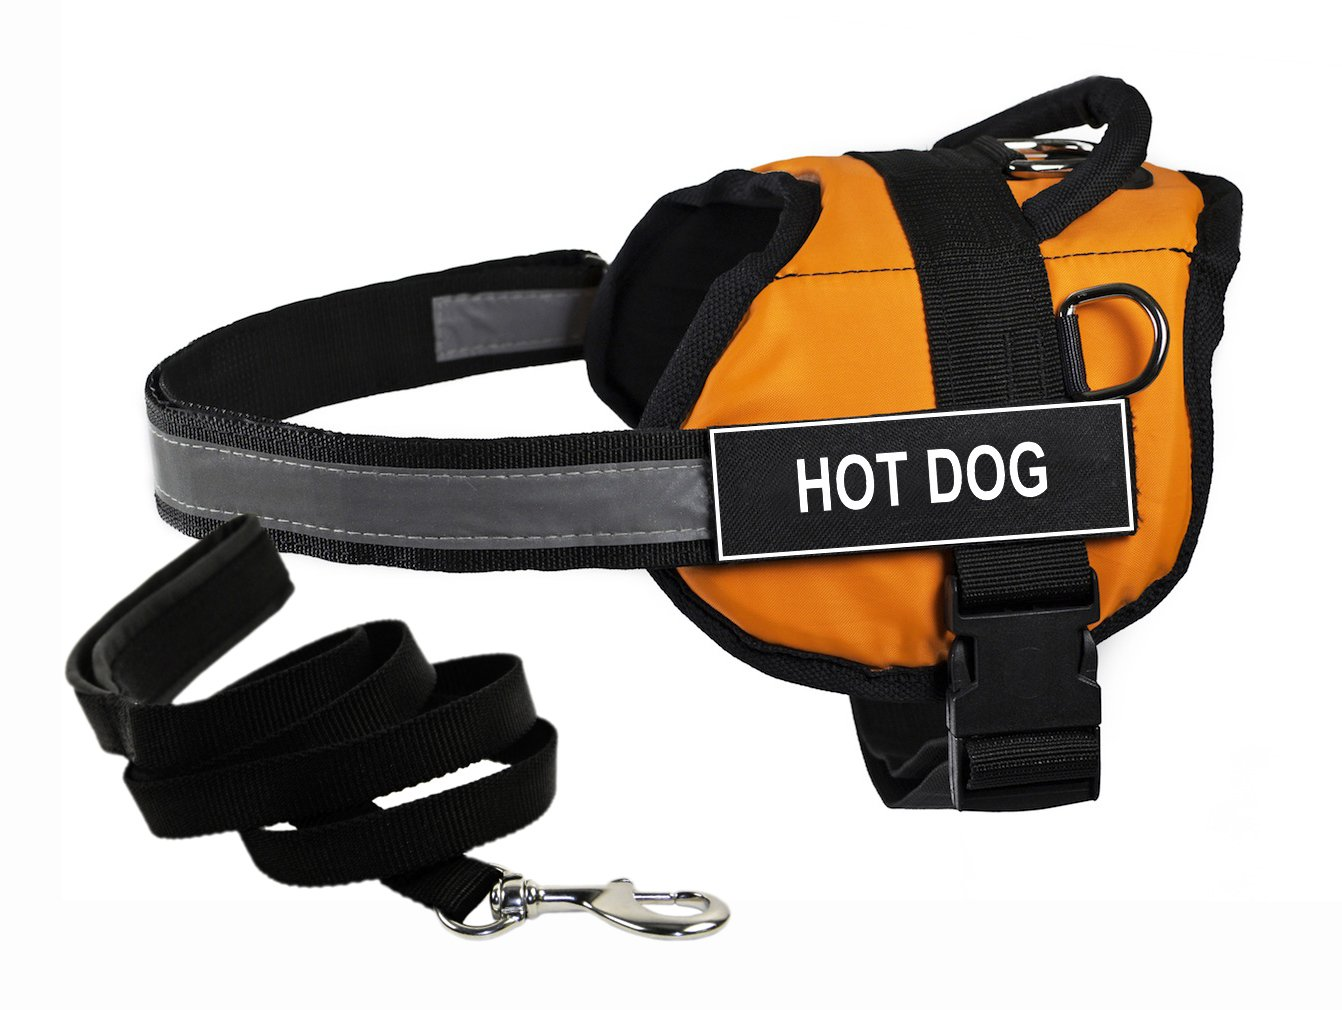 Dean & Tyler DT Works Hot Dog, Arancione Imbracatura Torace con Imbottitura, XS, e Nero 1,8 m Padded Puppy guinzaglio.